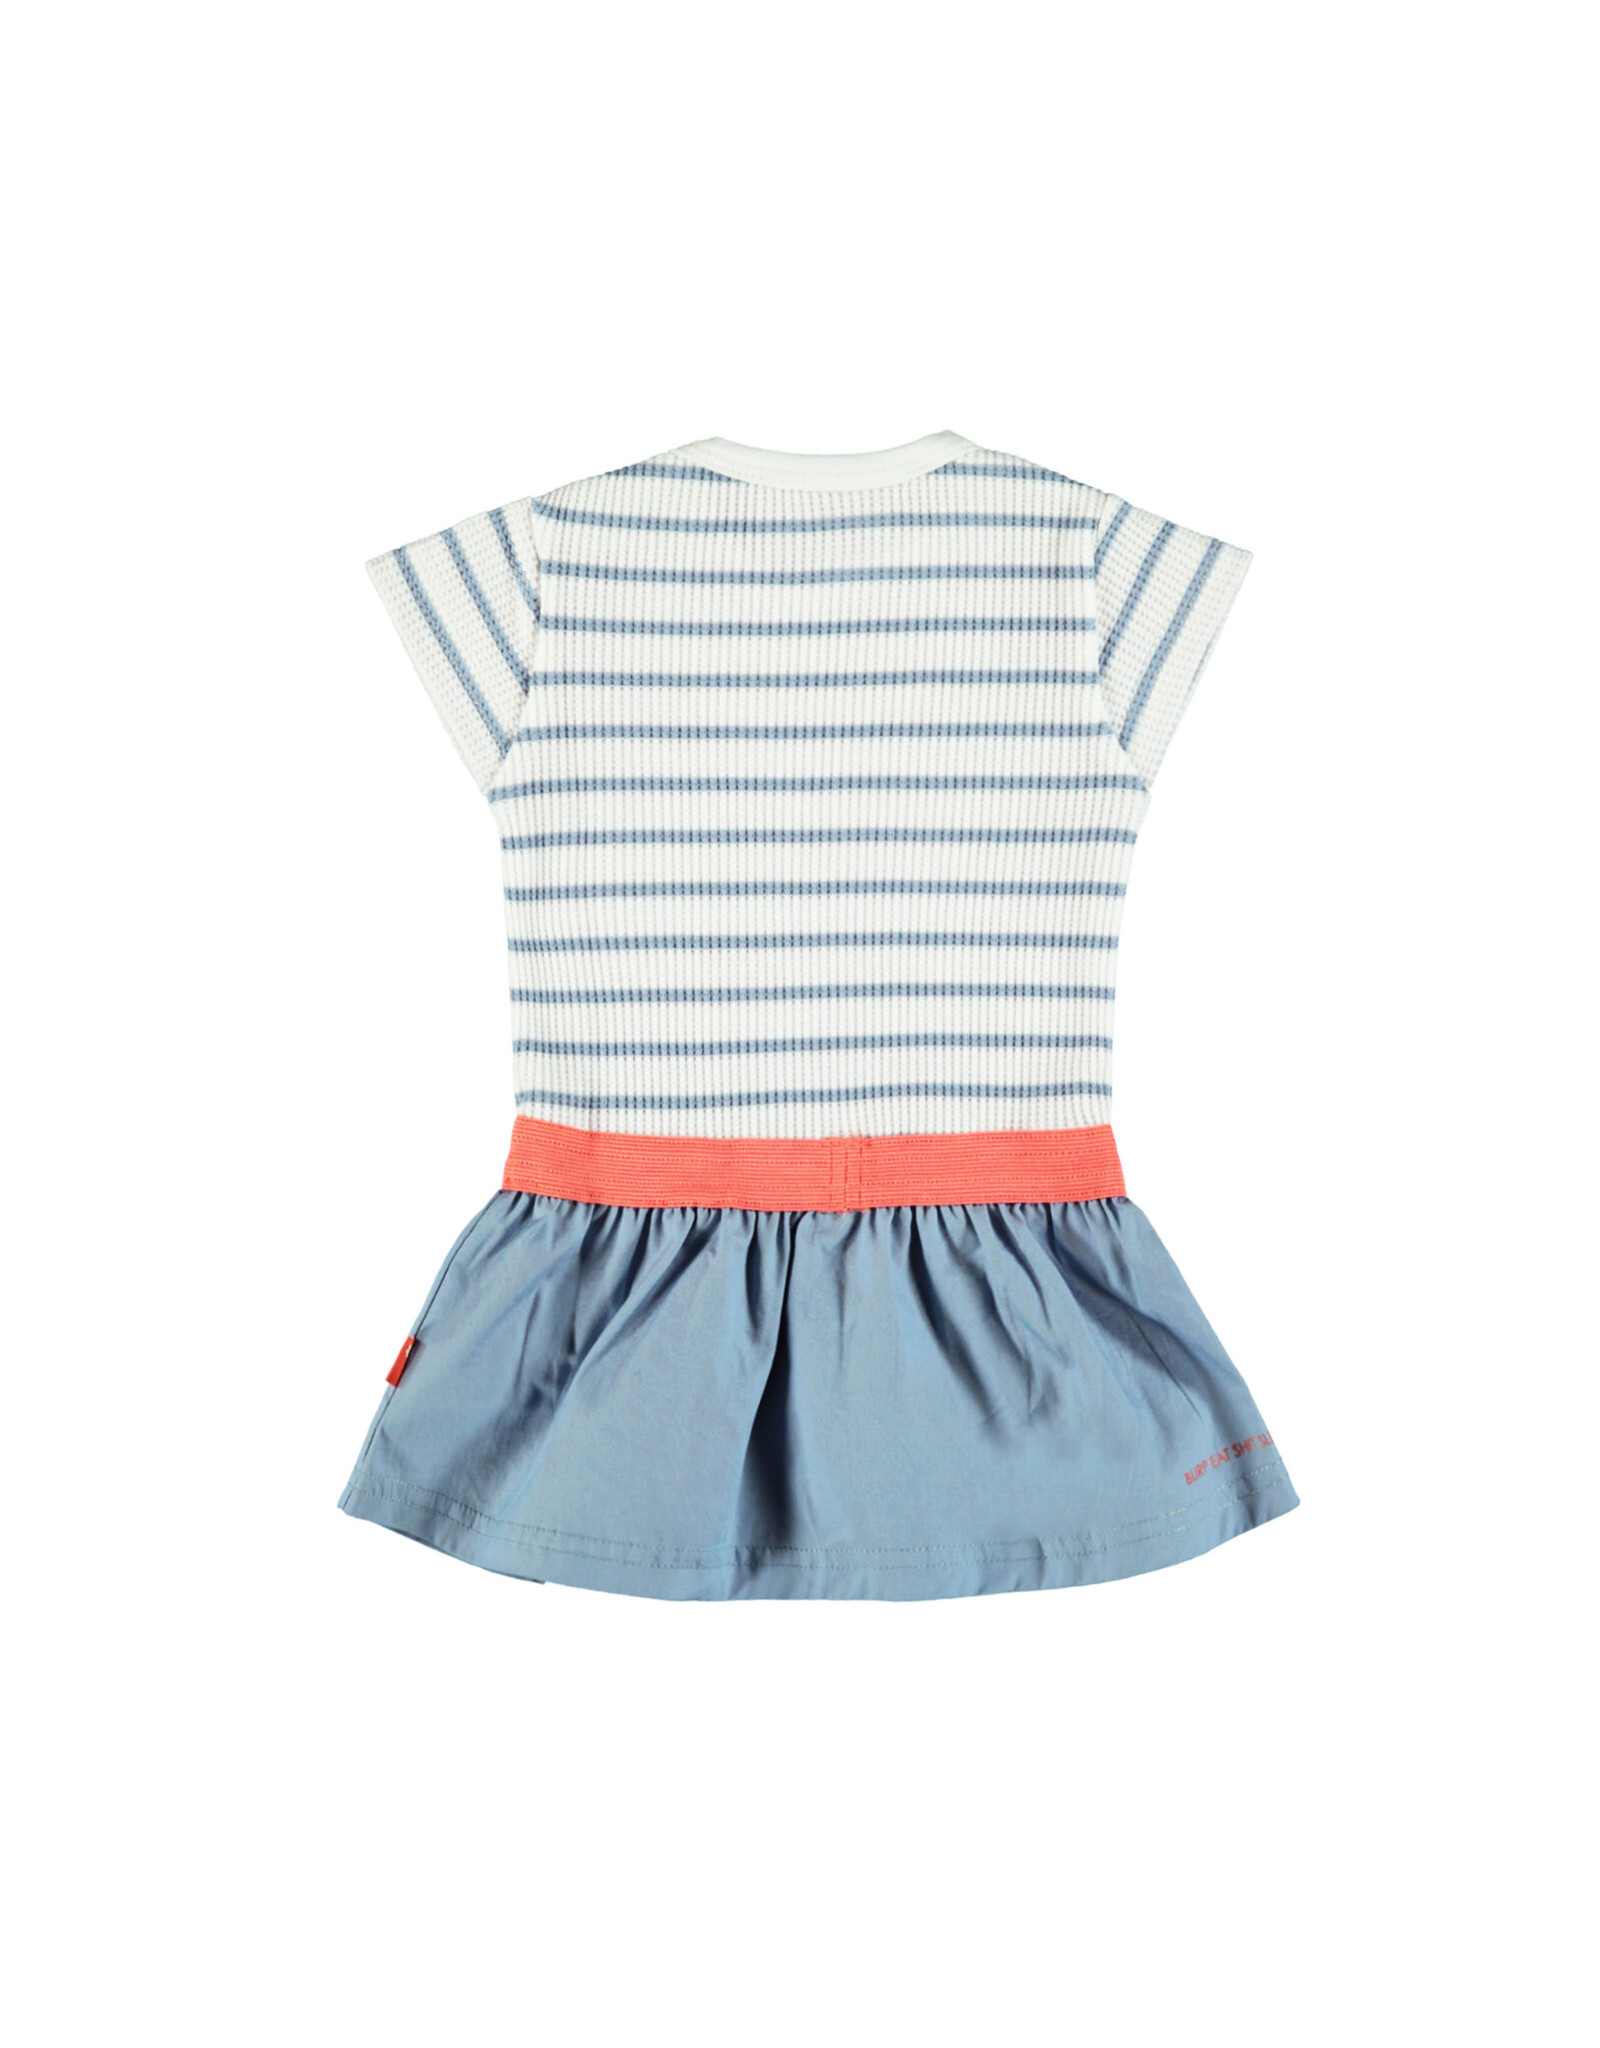 BESS Dress Striped White